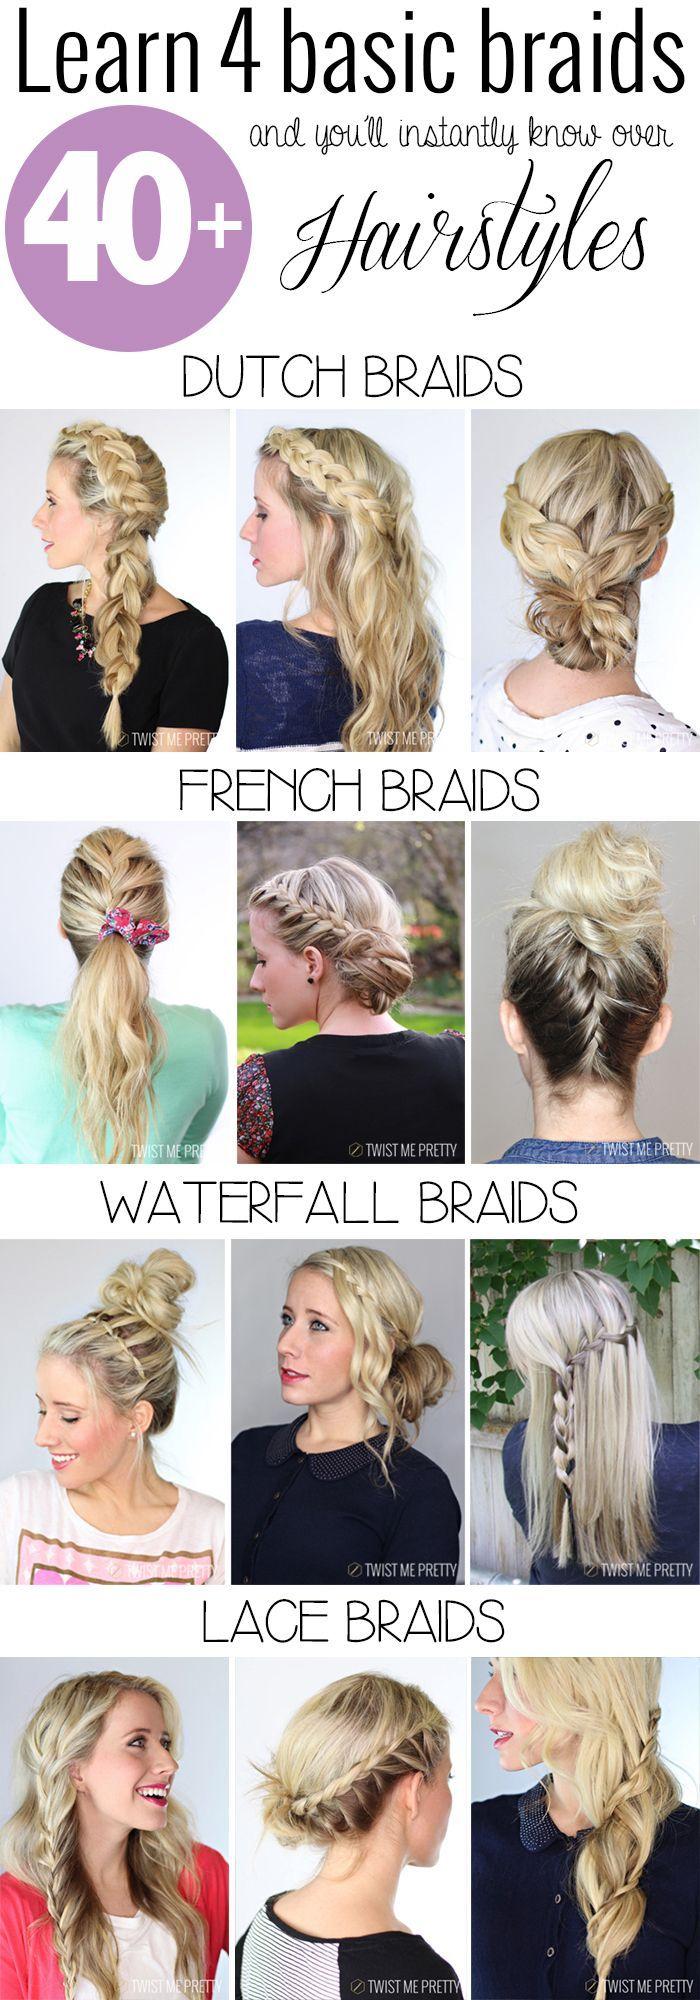 DIY | 4 basic braids (Twist Me Pretty) - http://1pic4u.com/2015/09/01/diy-4-basic-braids-twist-me-pretty/